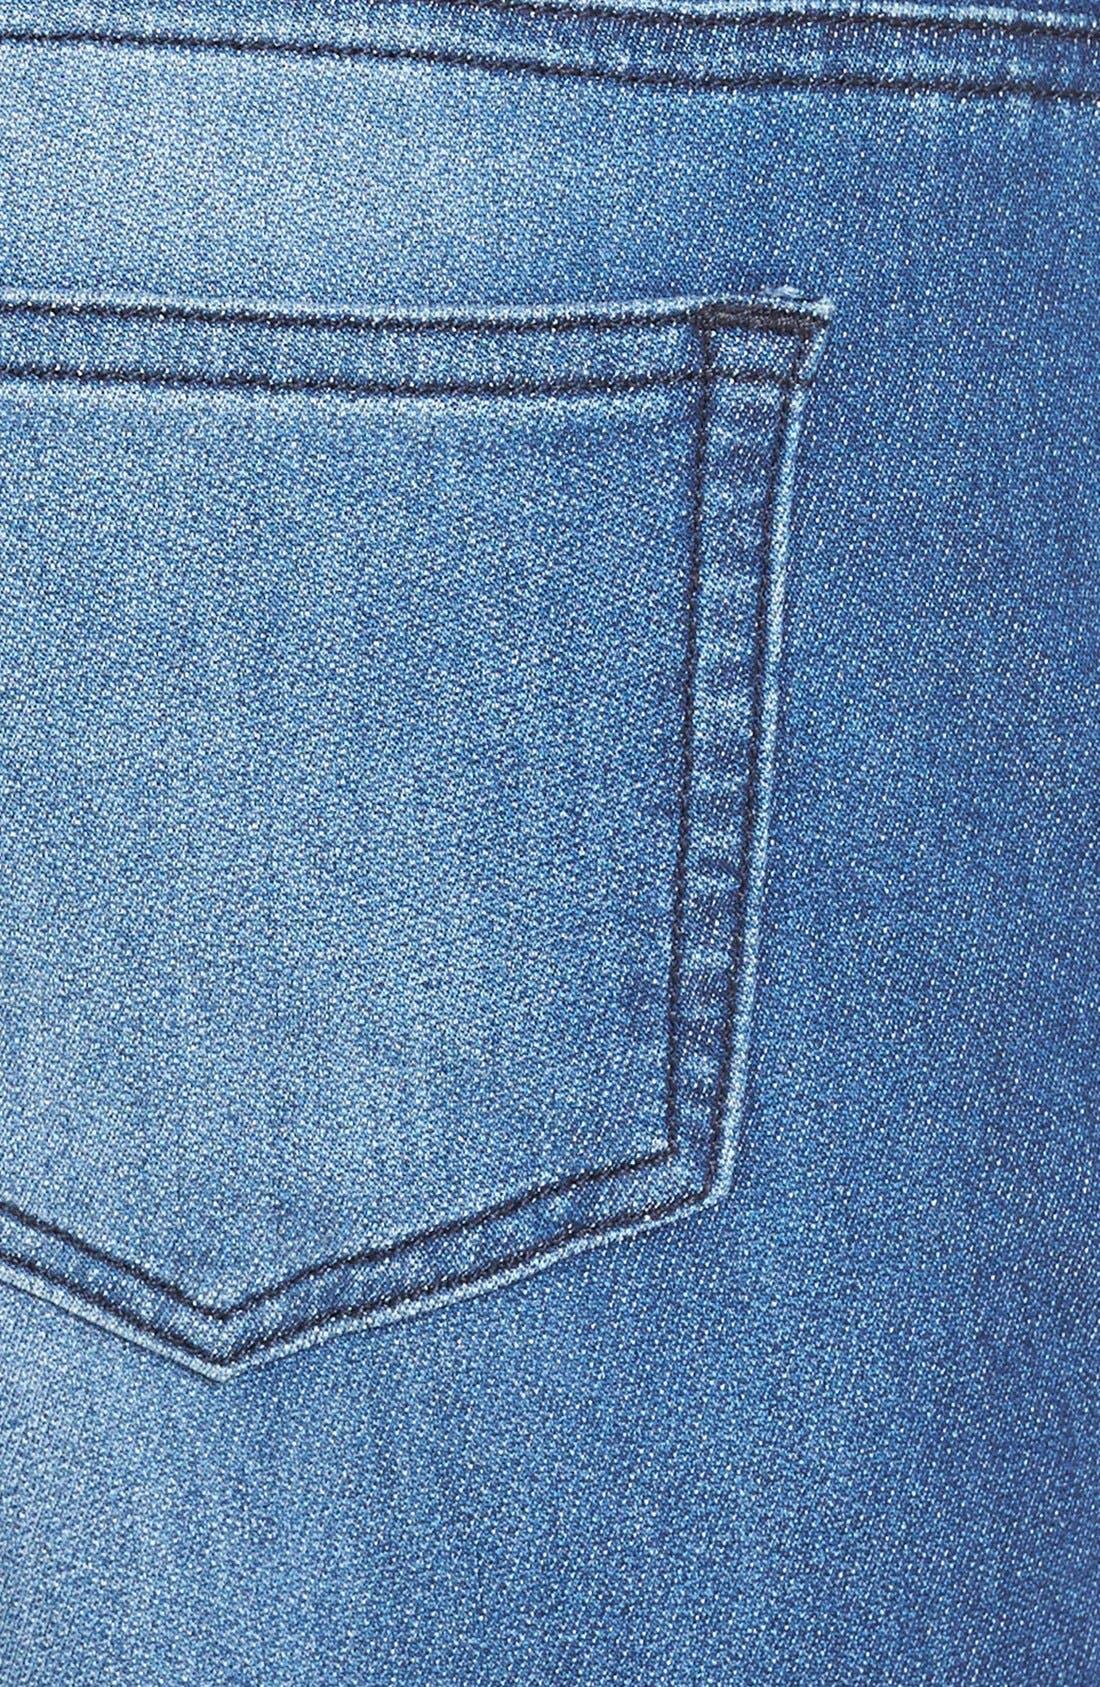 Alternate Image 3  - SP Black Denim Print Knit Crop Jogger Pants